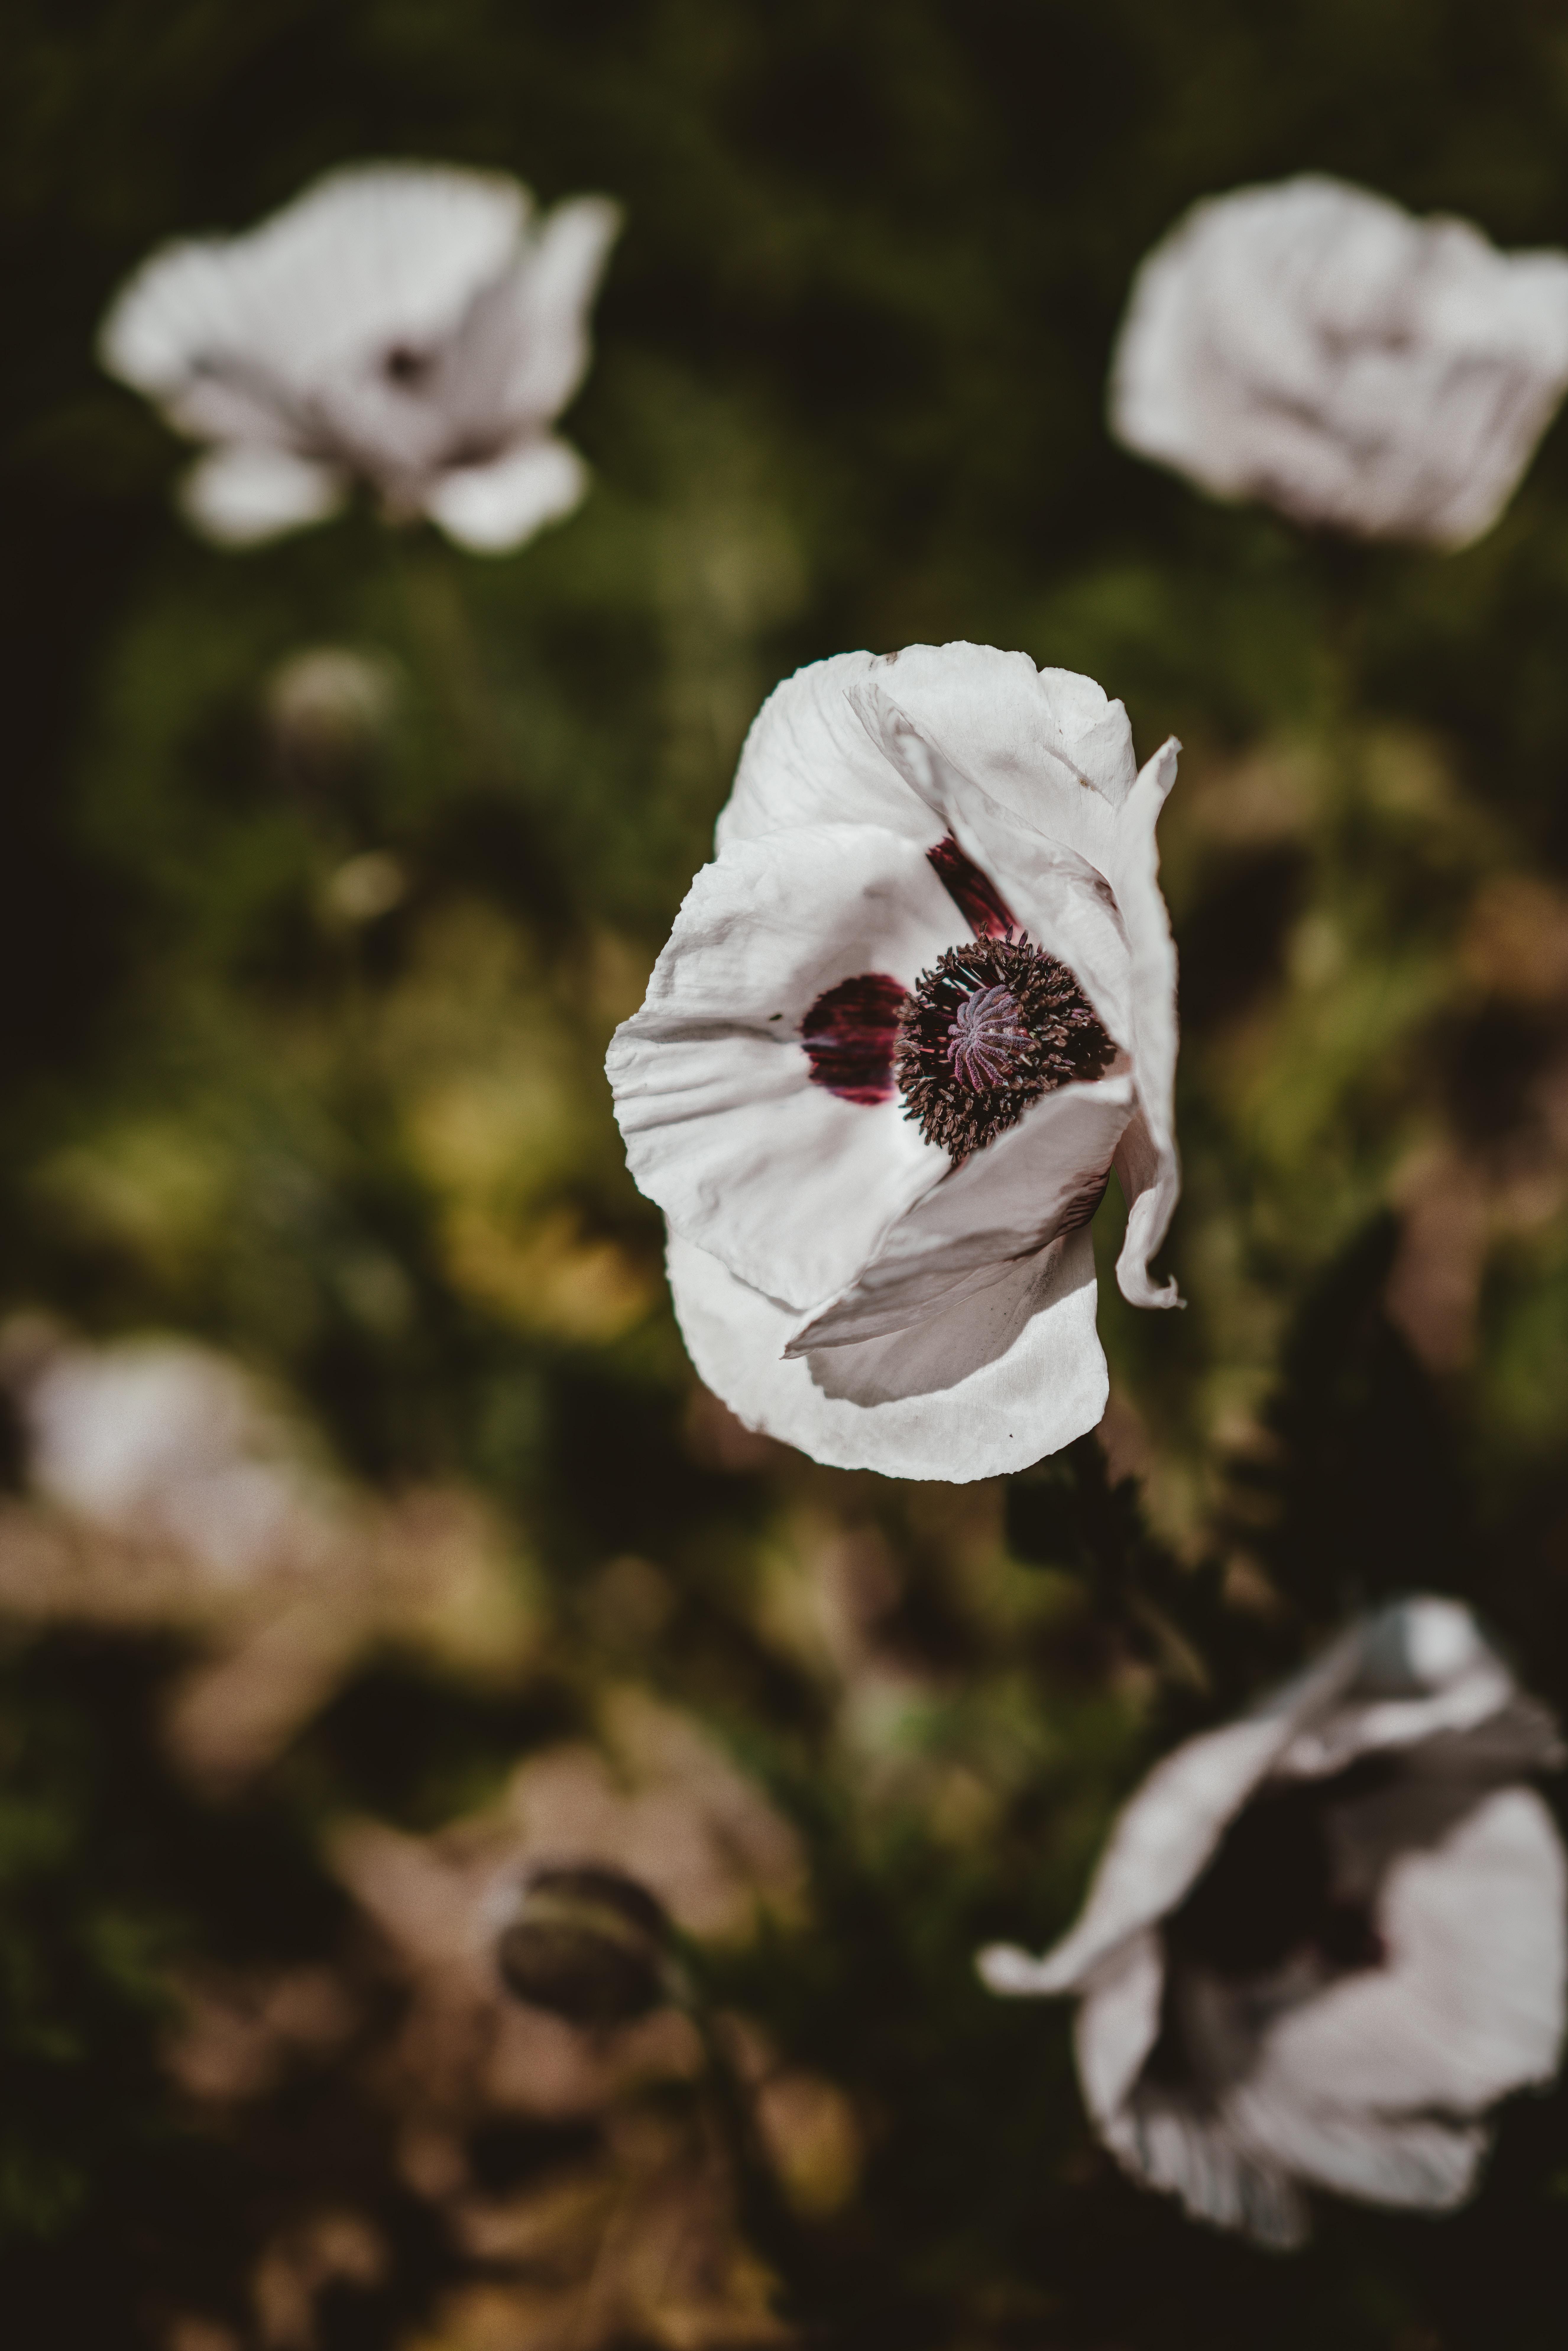 selective focus photo of anemone flower